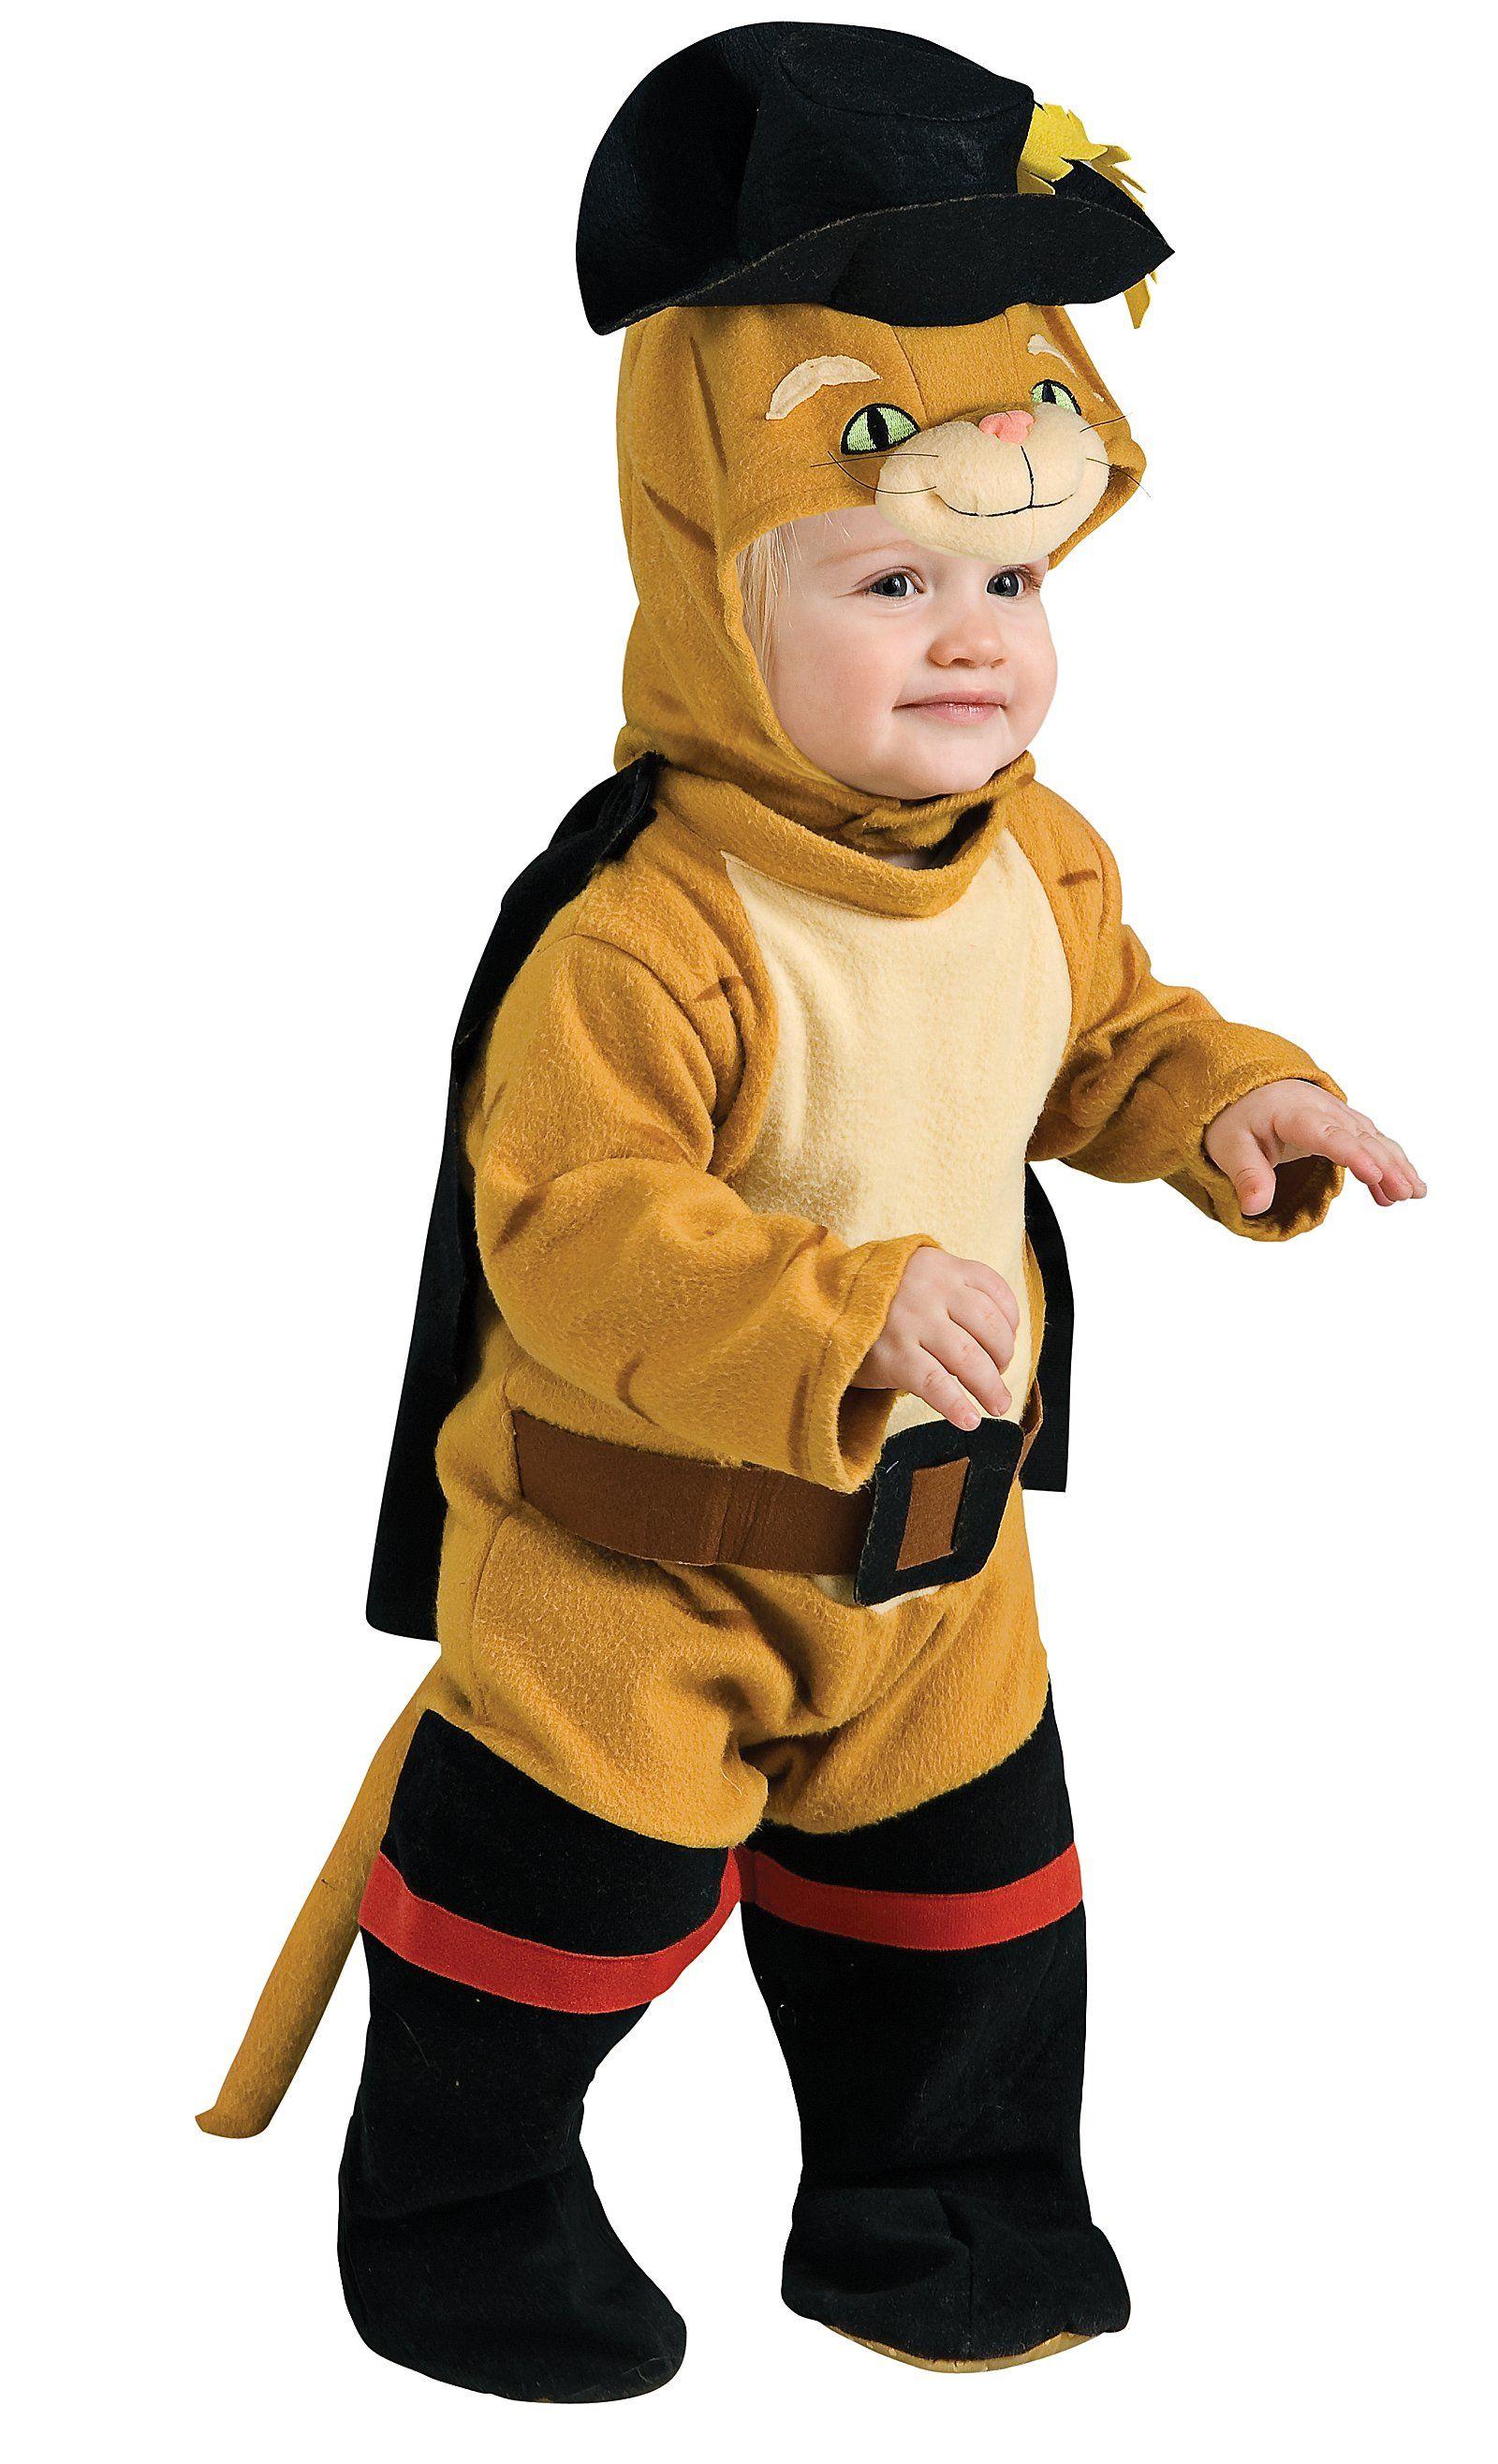 Shrek Soft Hands Accessory For Kids Toddler Costumes